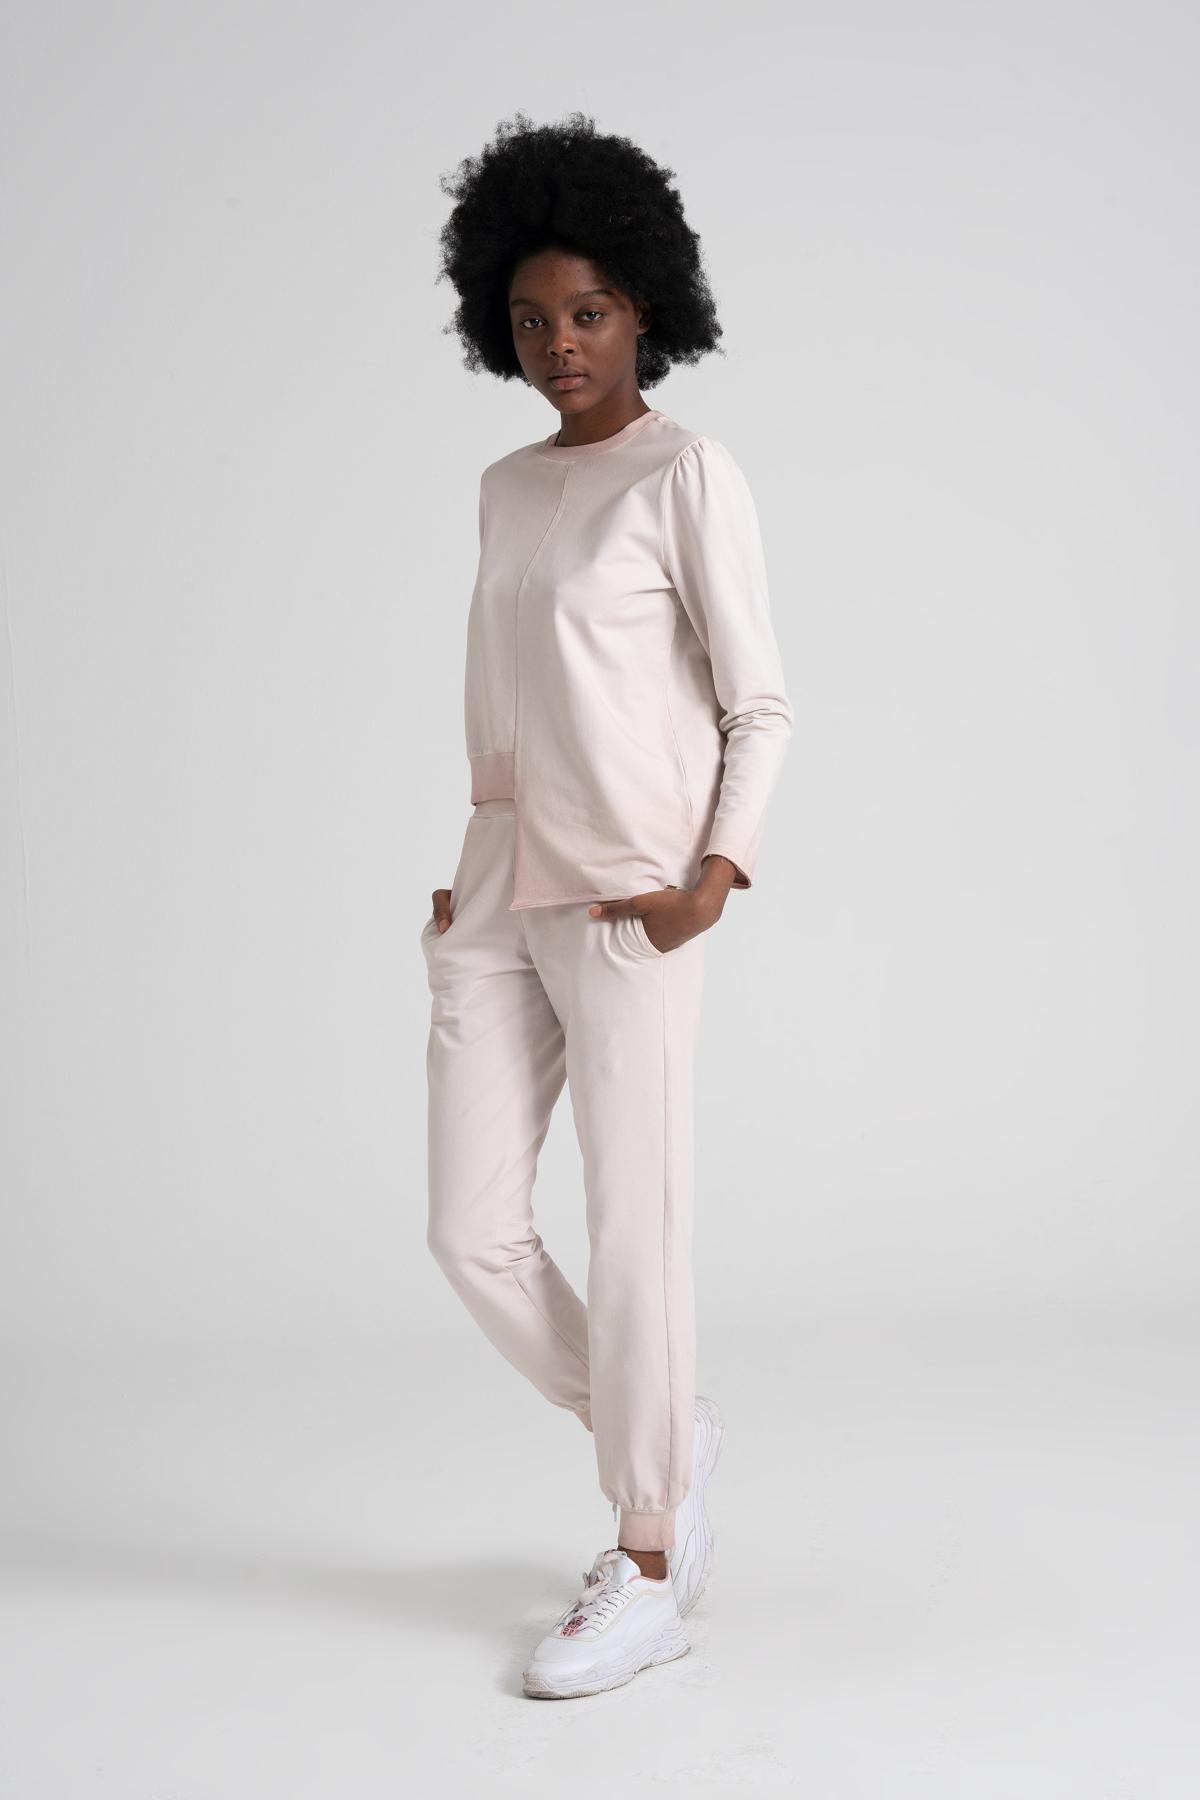 Vintage Effect 95% Cotton Sweatshirt newces-1031-VR